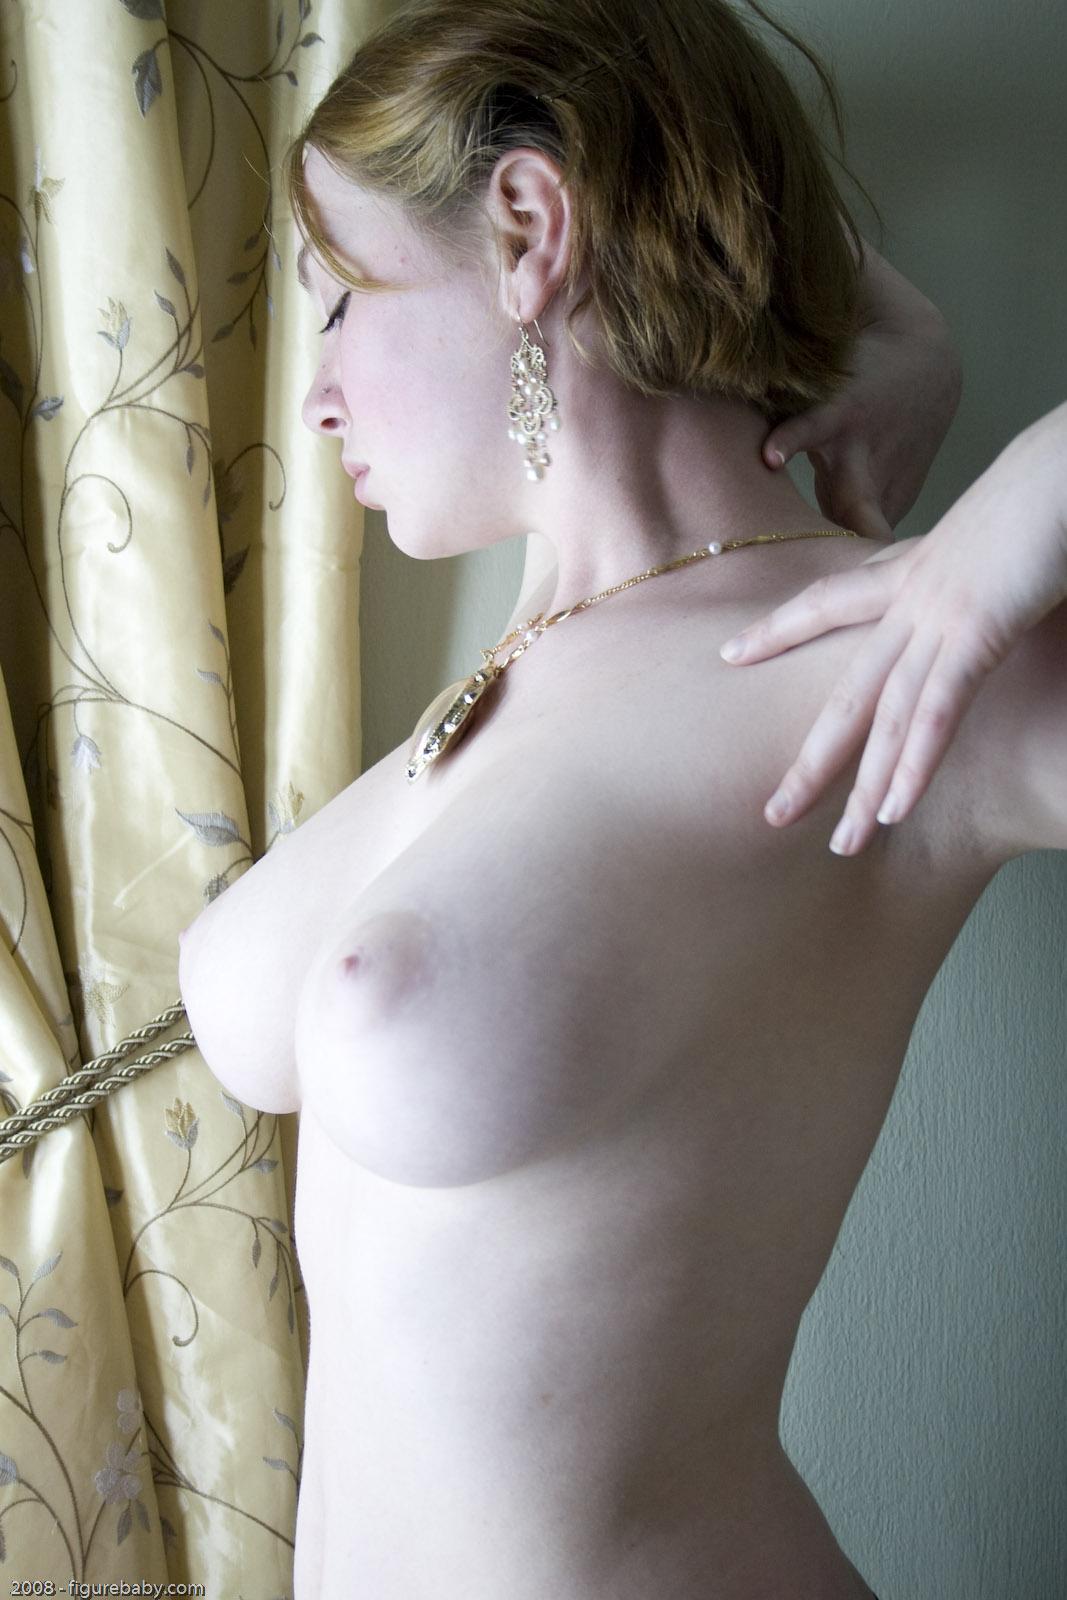 Sex vagina muscles